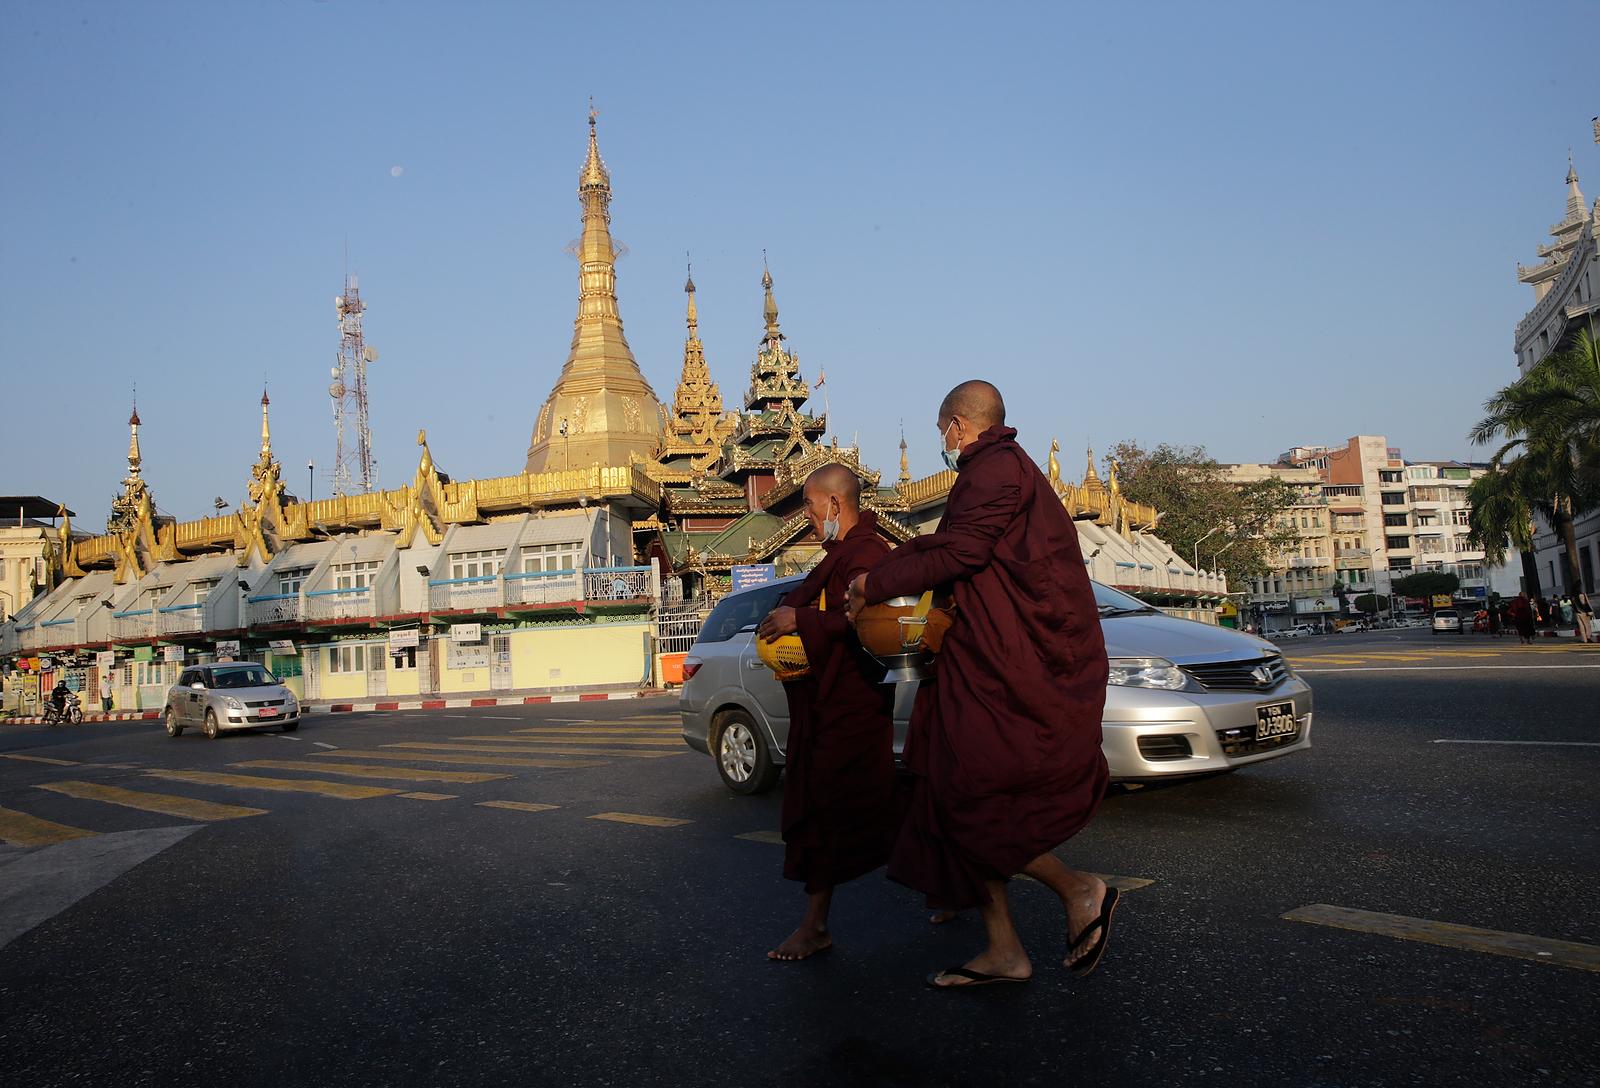 Buddhist monks walks in front of Sule Pagoda near Yangon city hall in Yangon, Myanmar, 01 February 2021. EPA